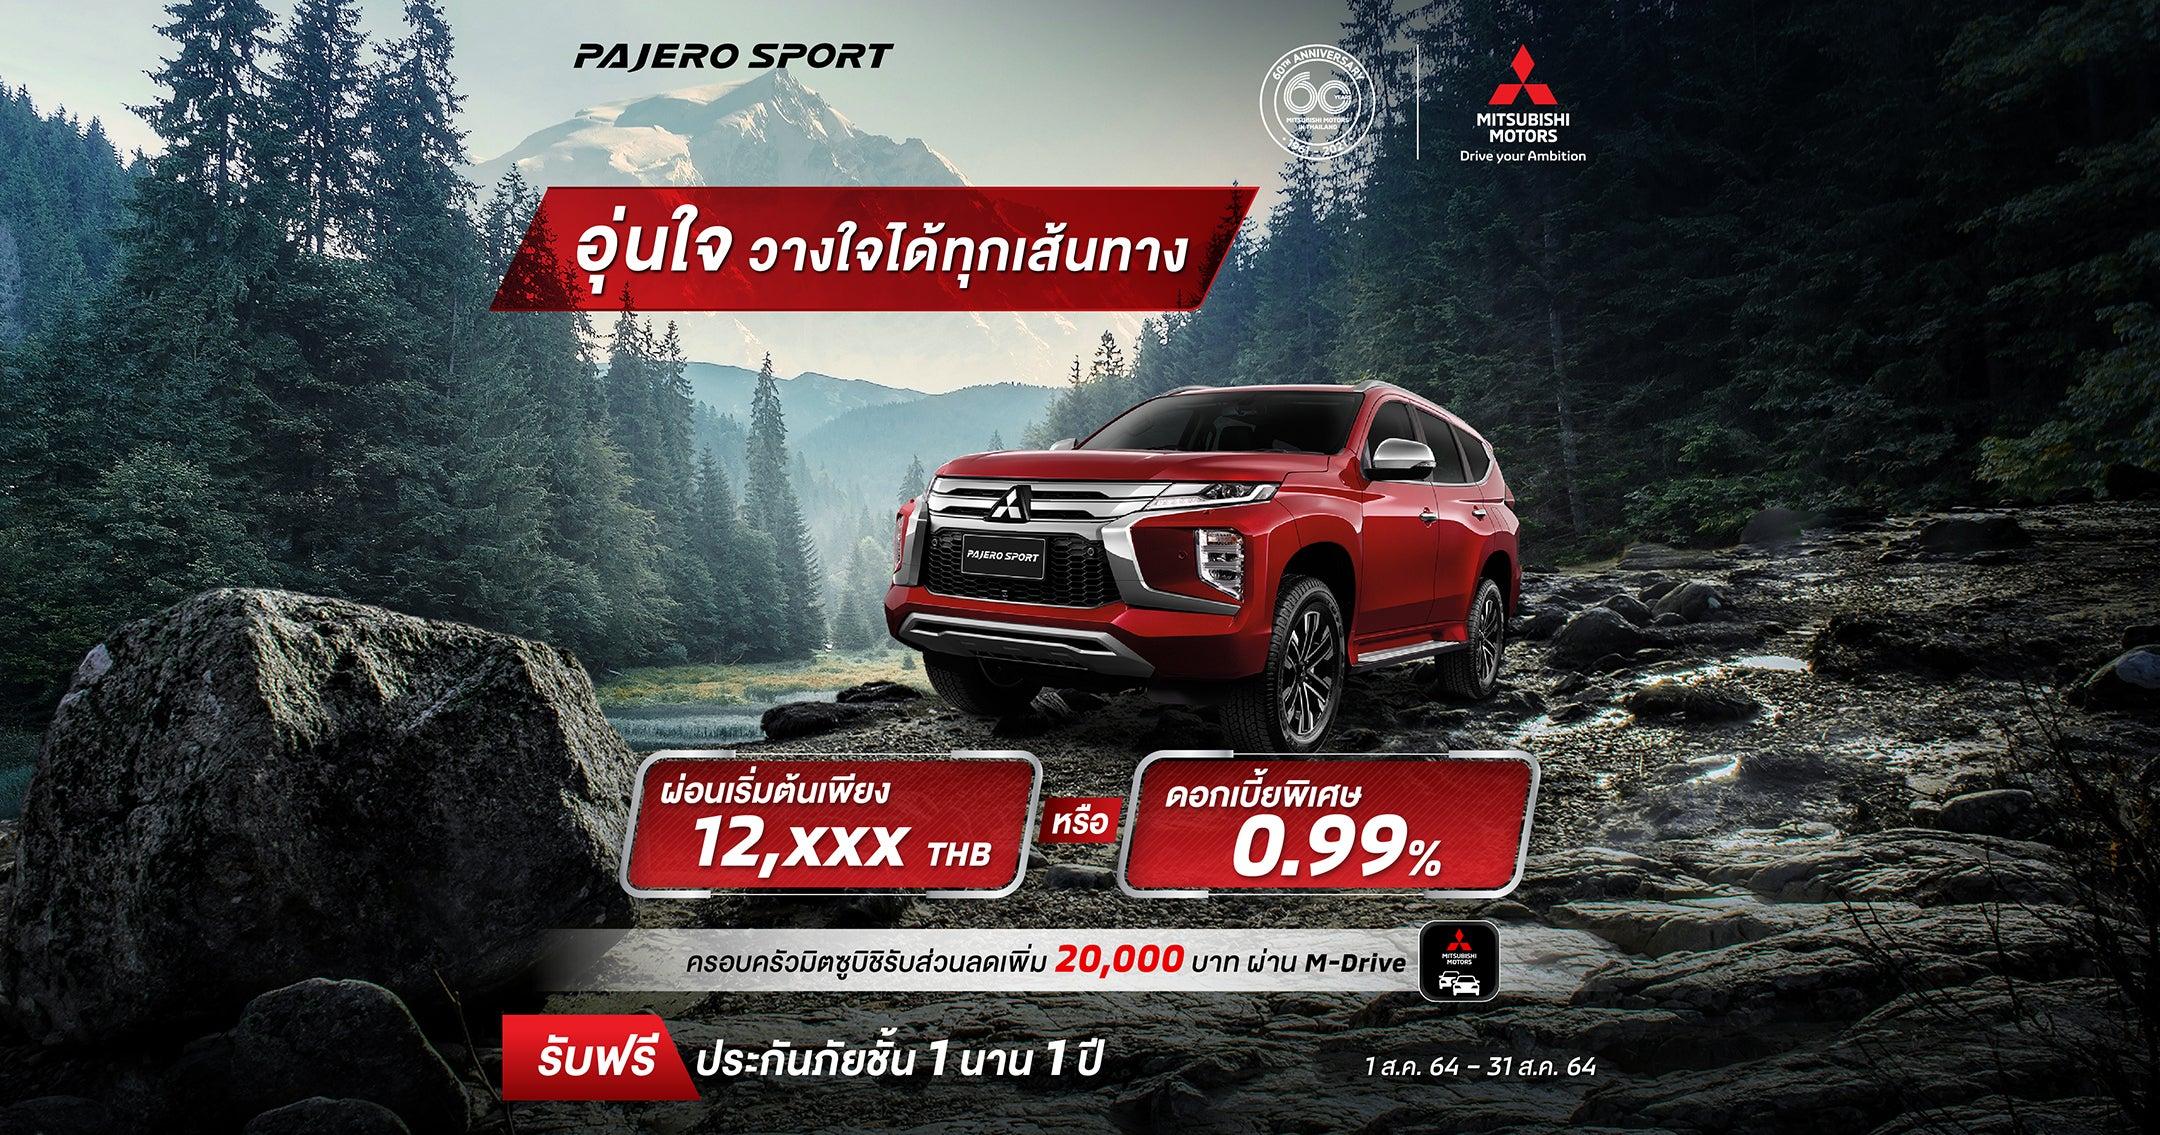 New Pajero Sport และ New Pajero Sport Elite Edition ผ่อนเริ่มต้นเพียง 12,XXX บาท